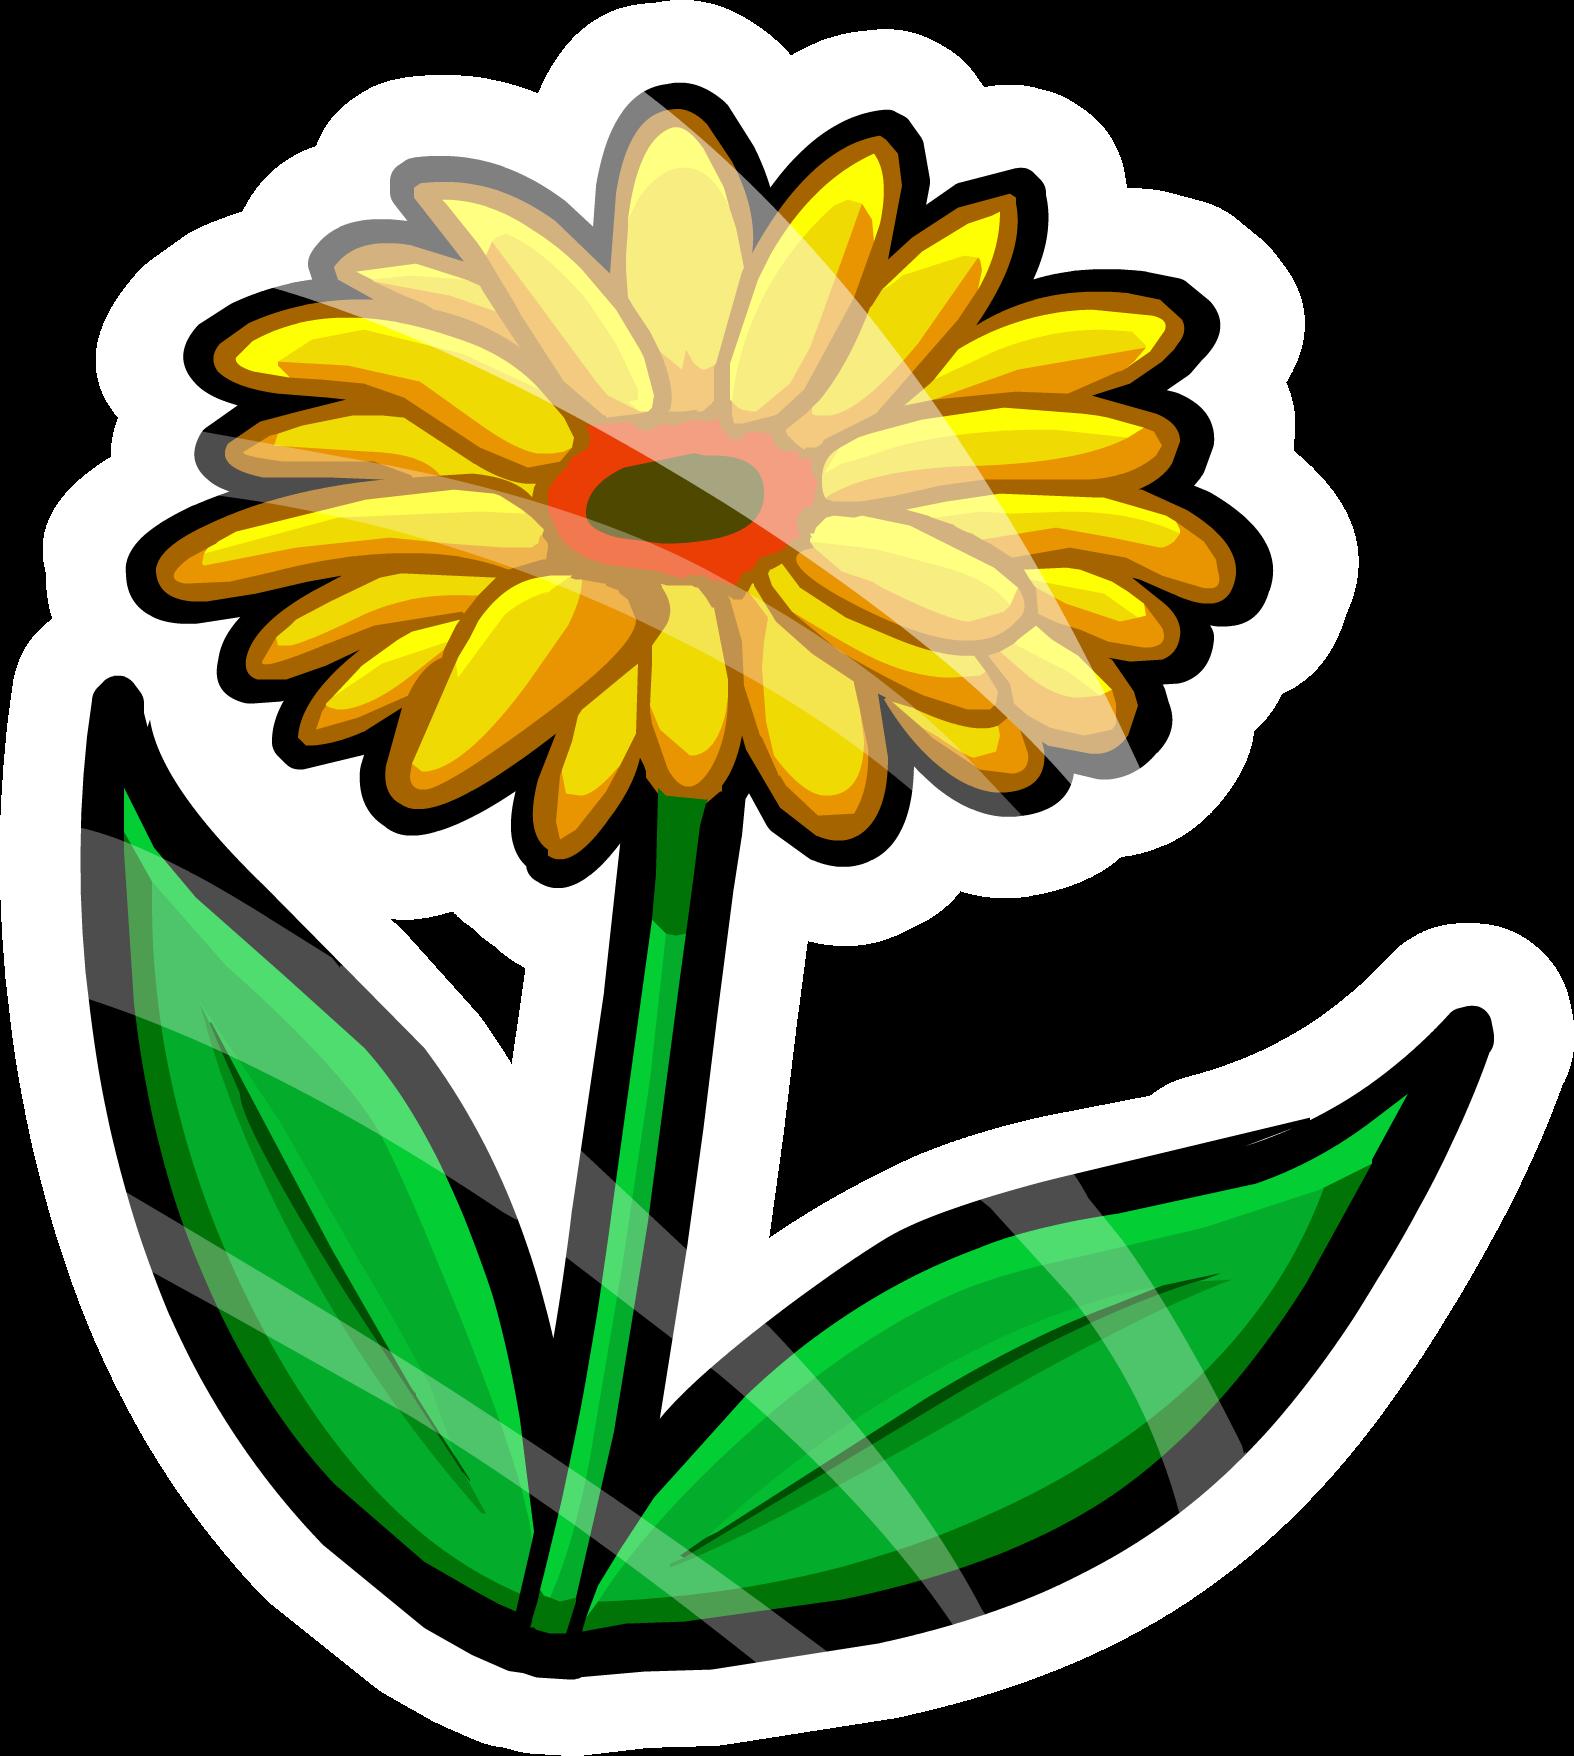 Spring flower pin club penguin wiki fandom powered by wikia spring flower pin mightylinksfo